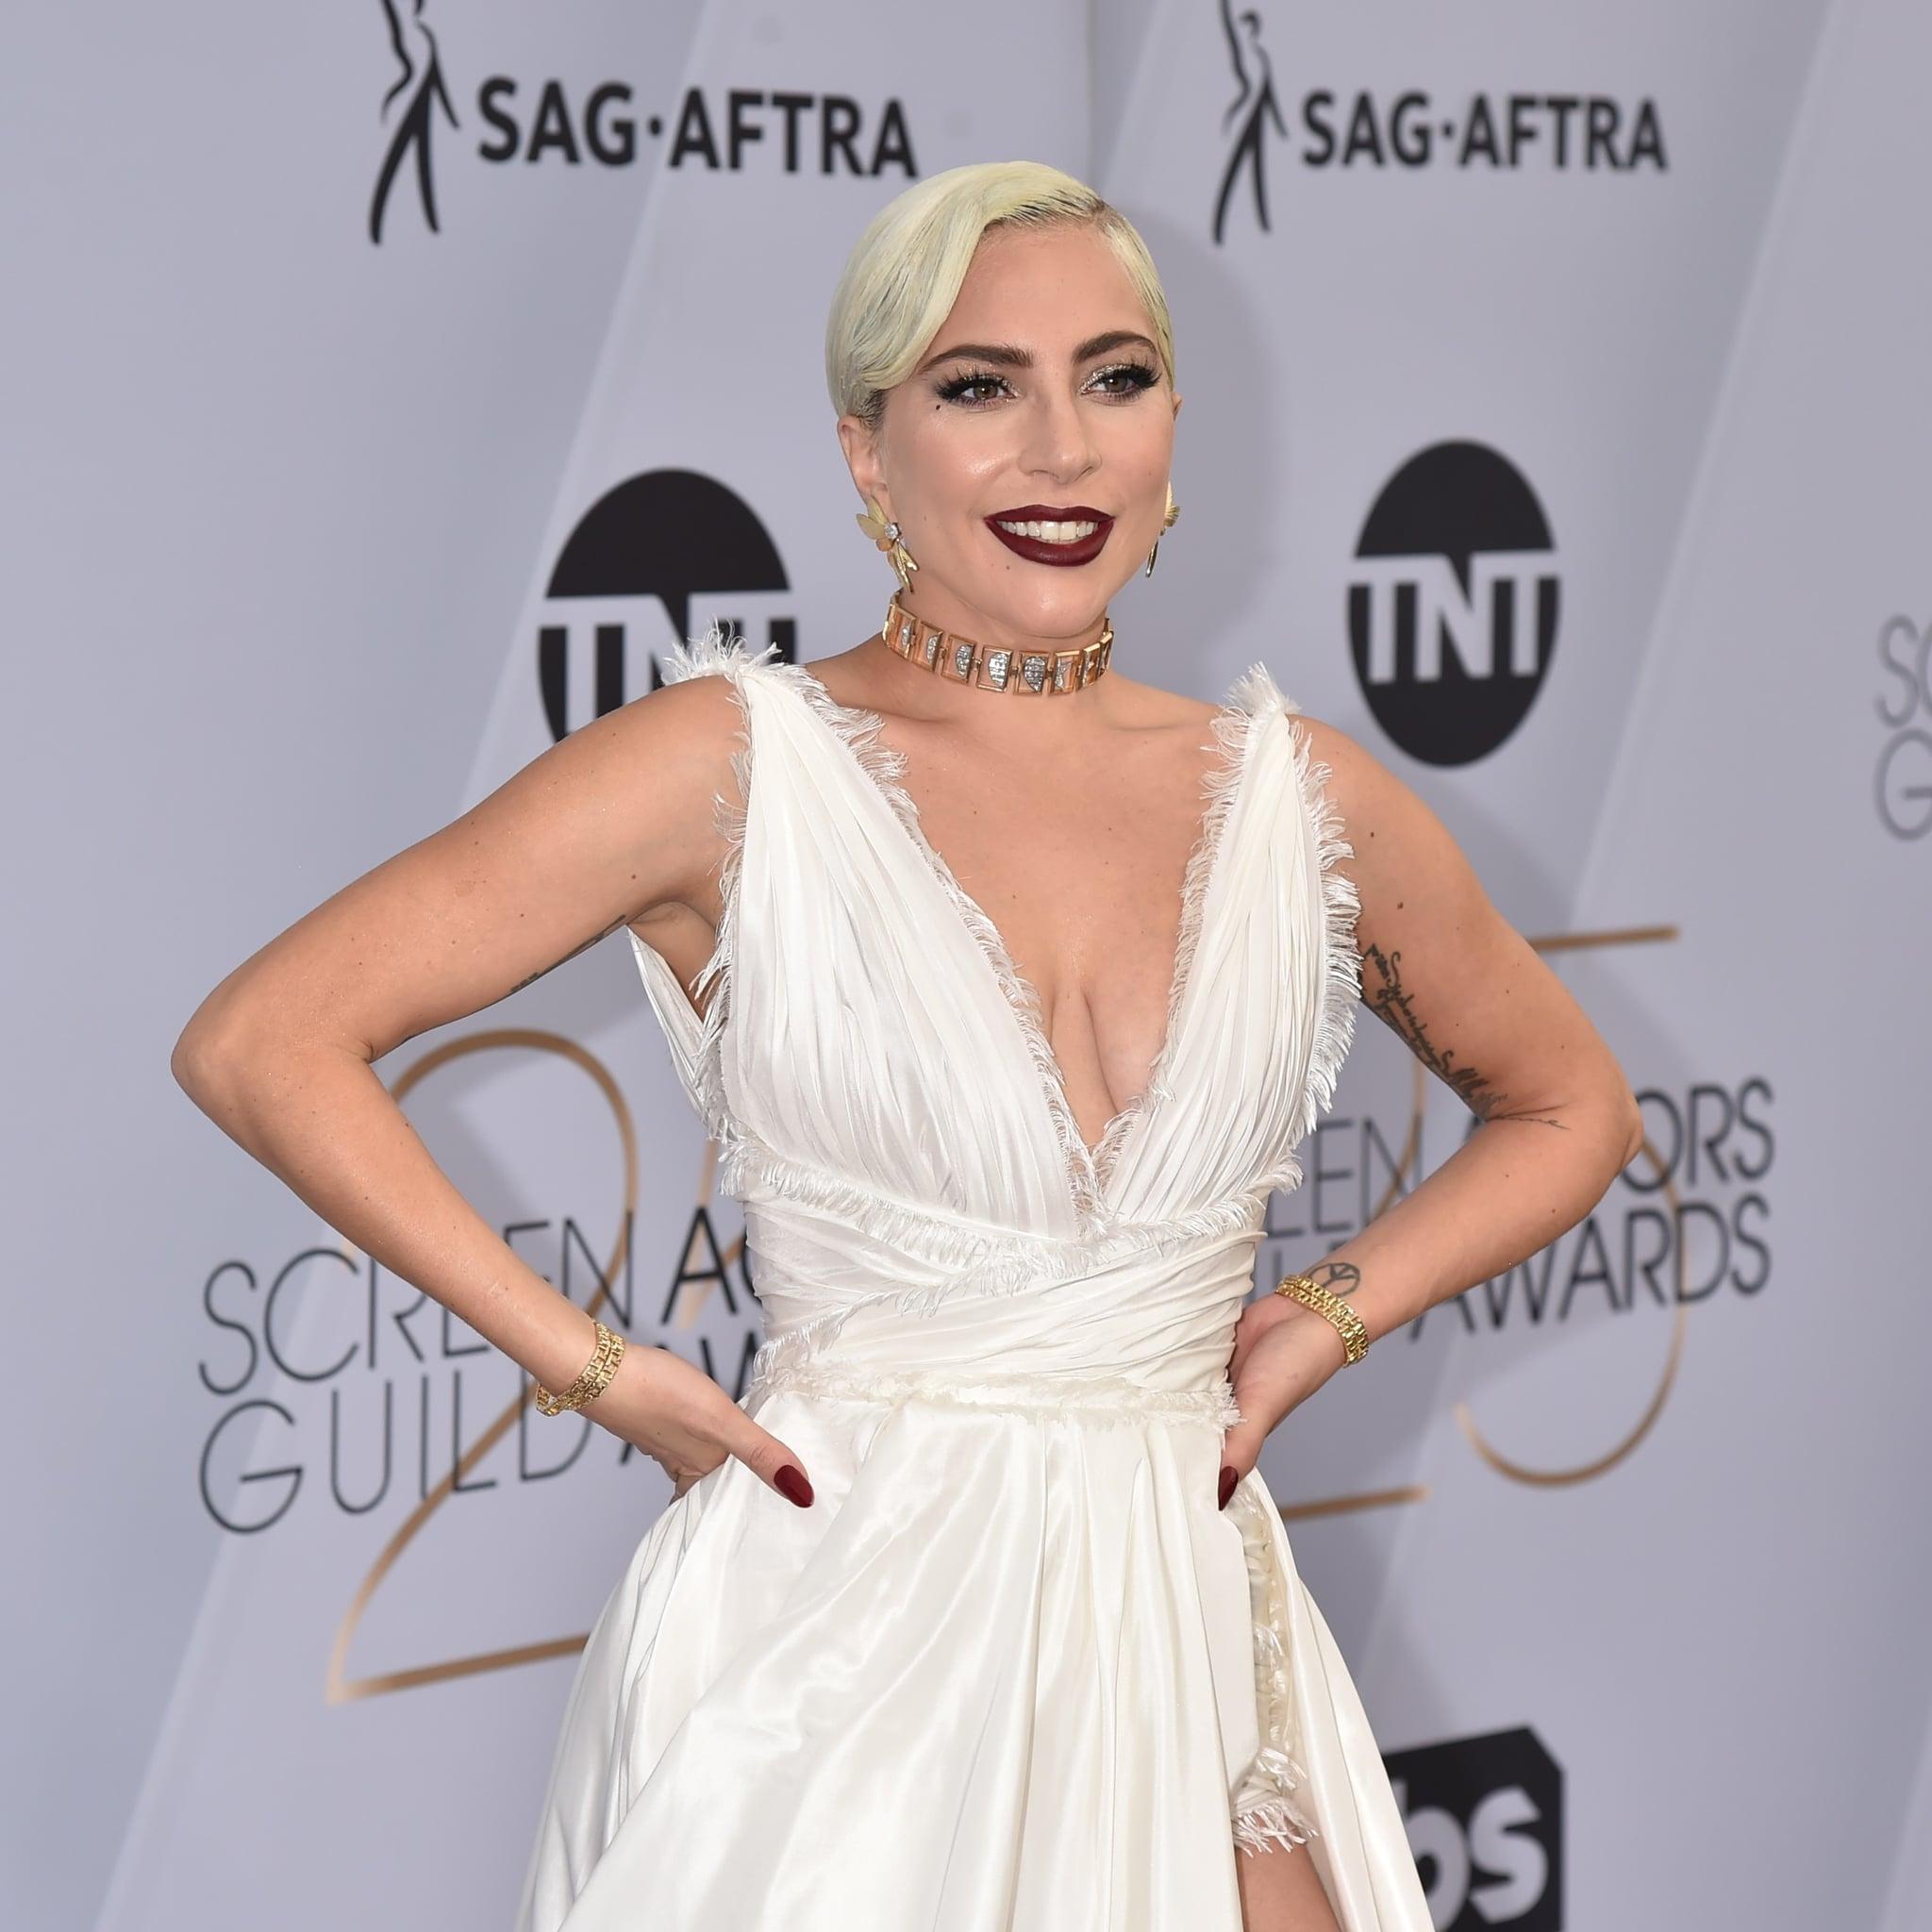 Lady-Gaga-Dior-Dress-SAG-Awards-2019.jpg